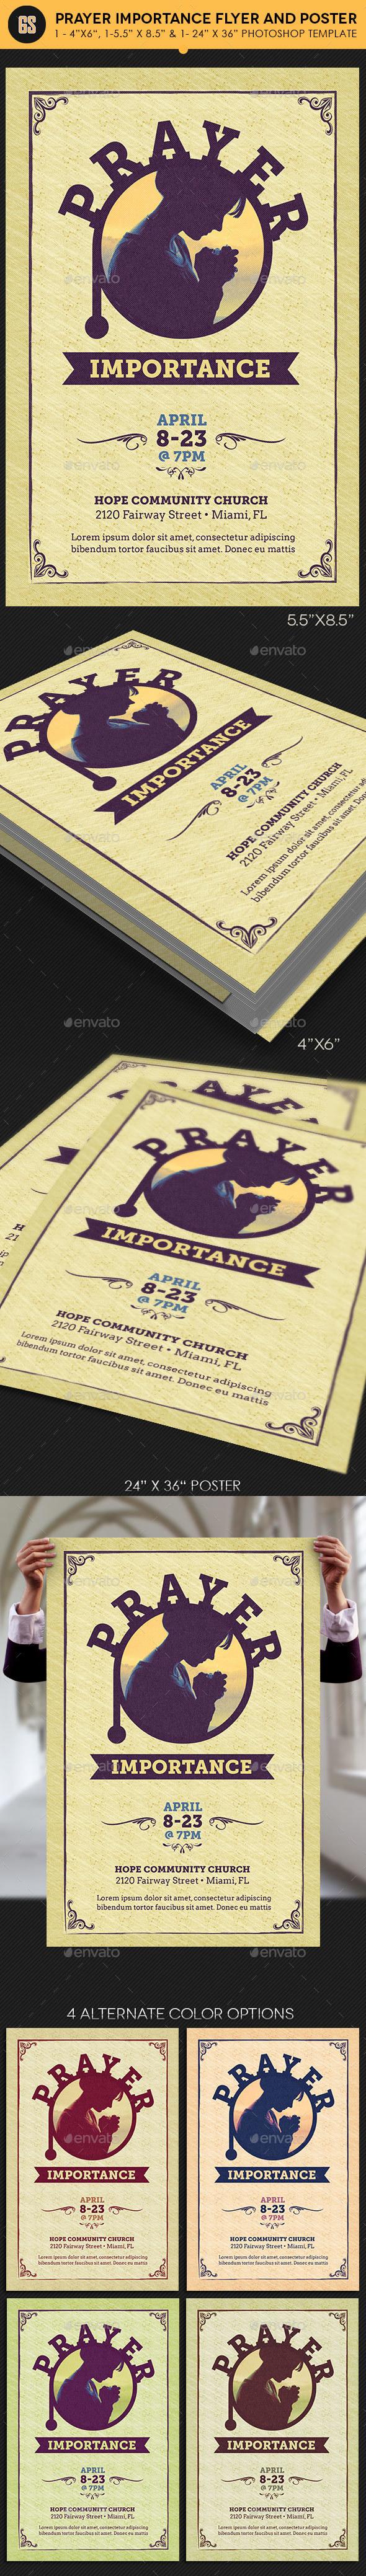 Prayer Importance Flyer Poster Template - Church Flyers